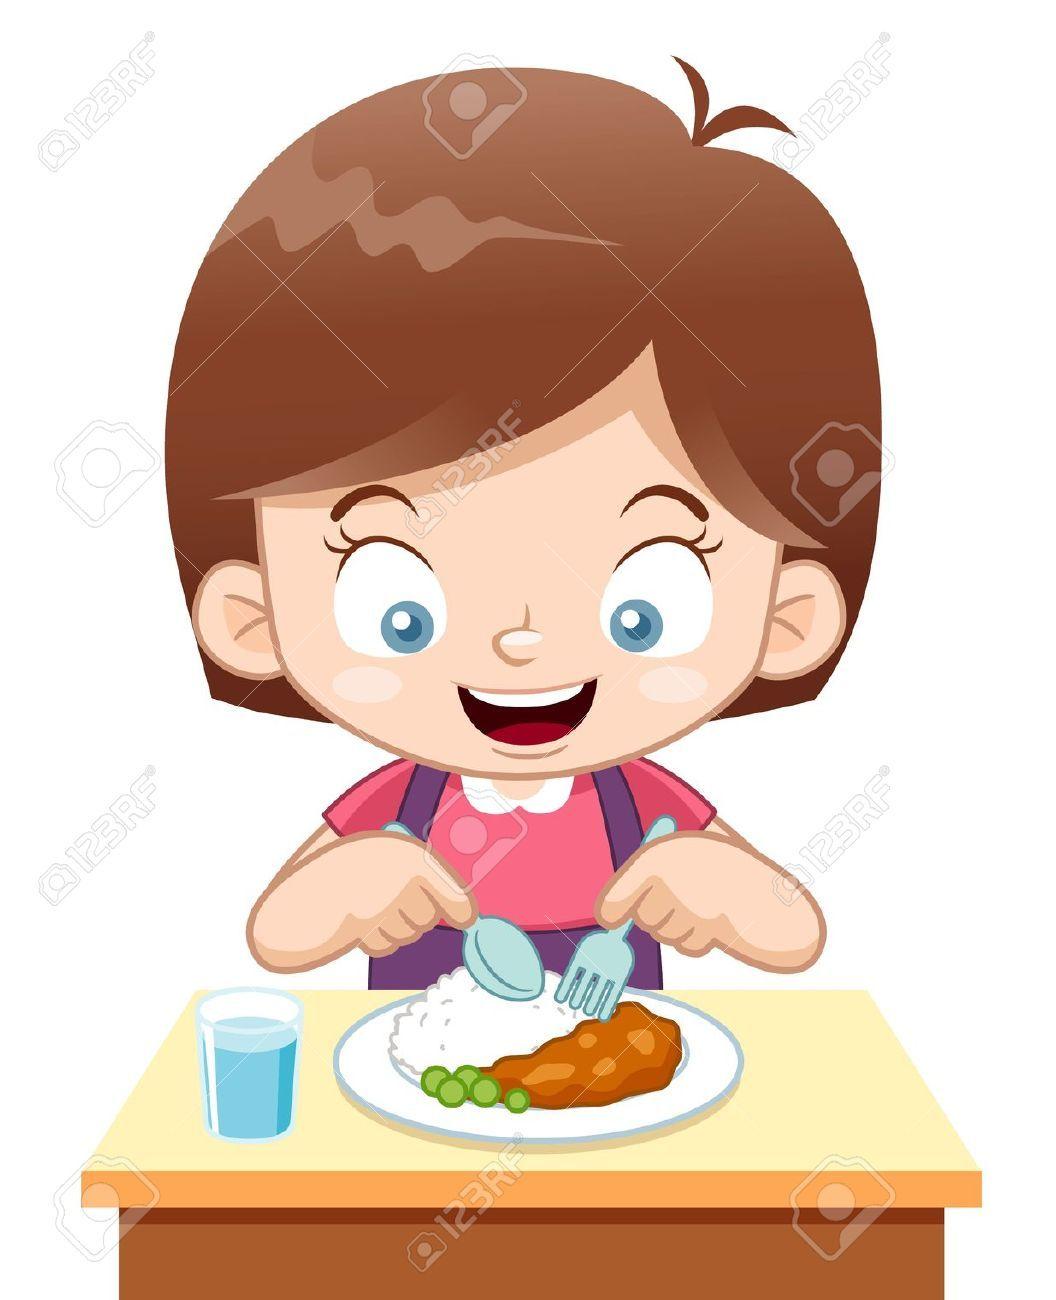 Girl Eating Dinner Cartooning 4 Kids Cartoon Kids Moral Stories For Kids